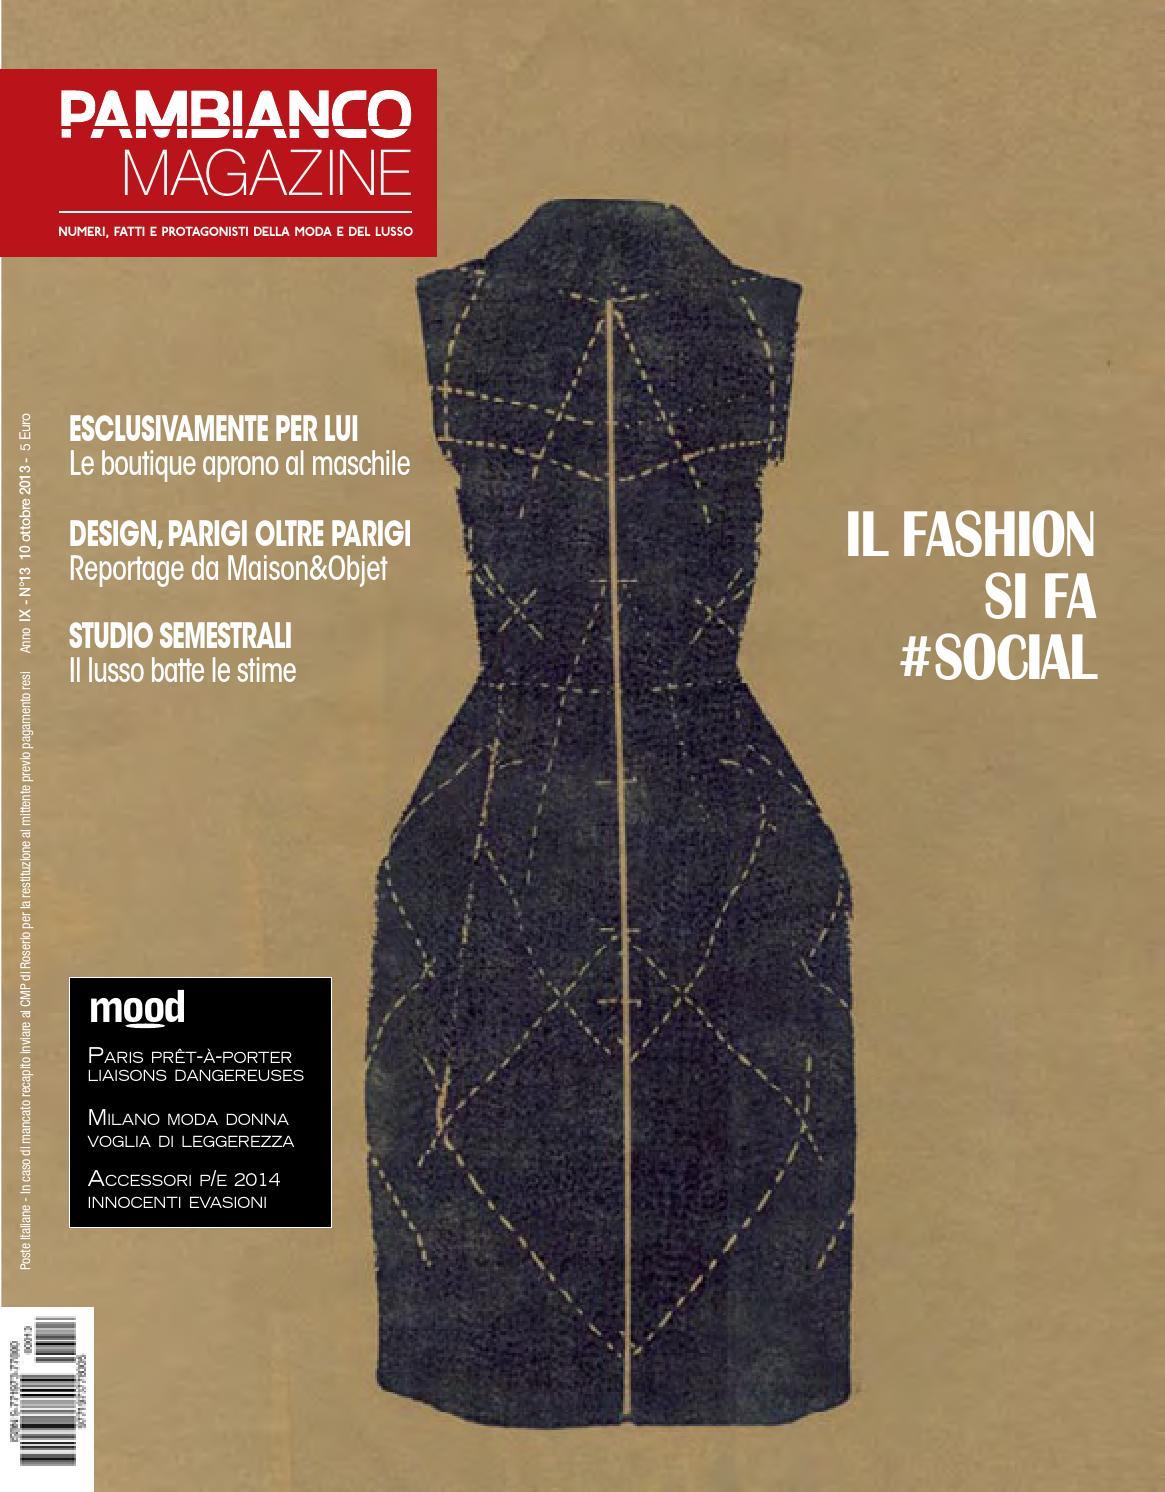 cca2edb921c2 Pambianco Magazine N.13 IX by Pambianconews - issuu